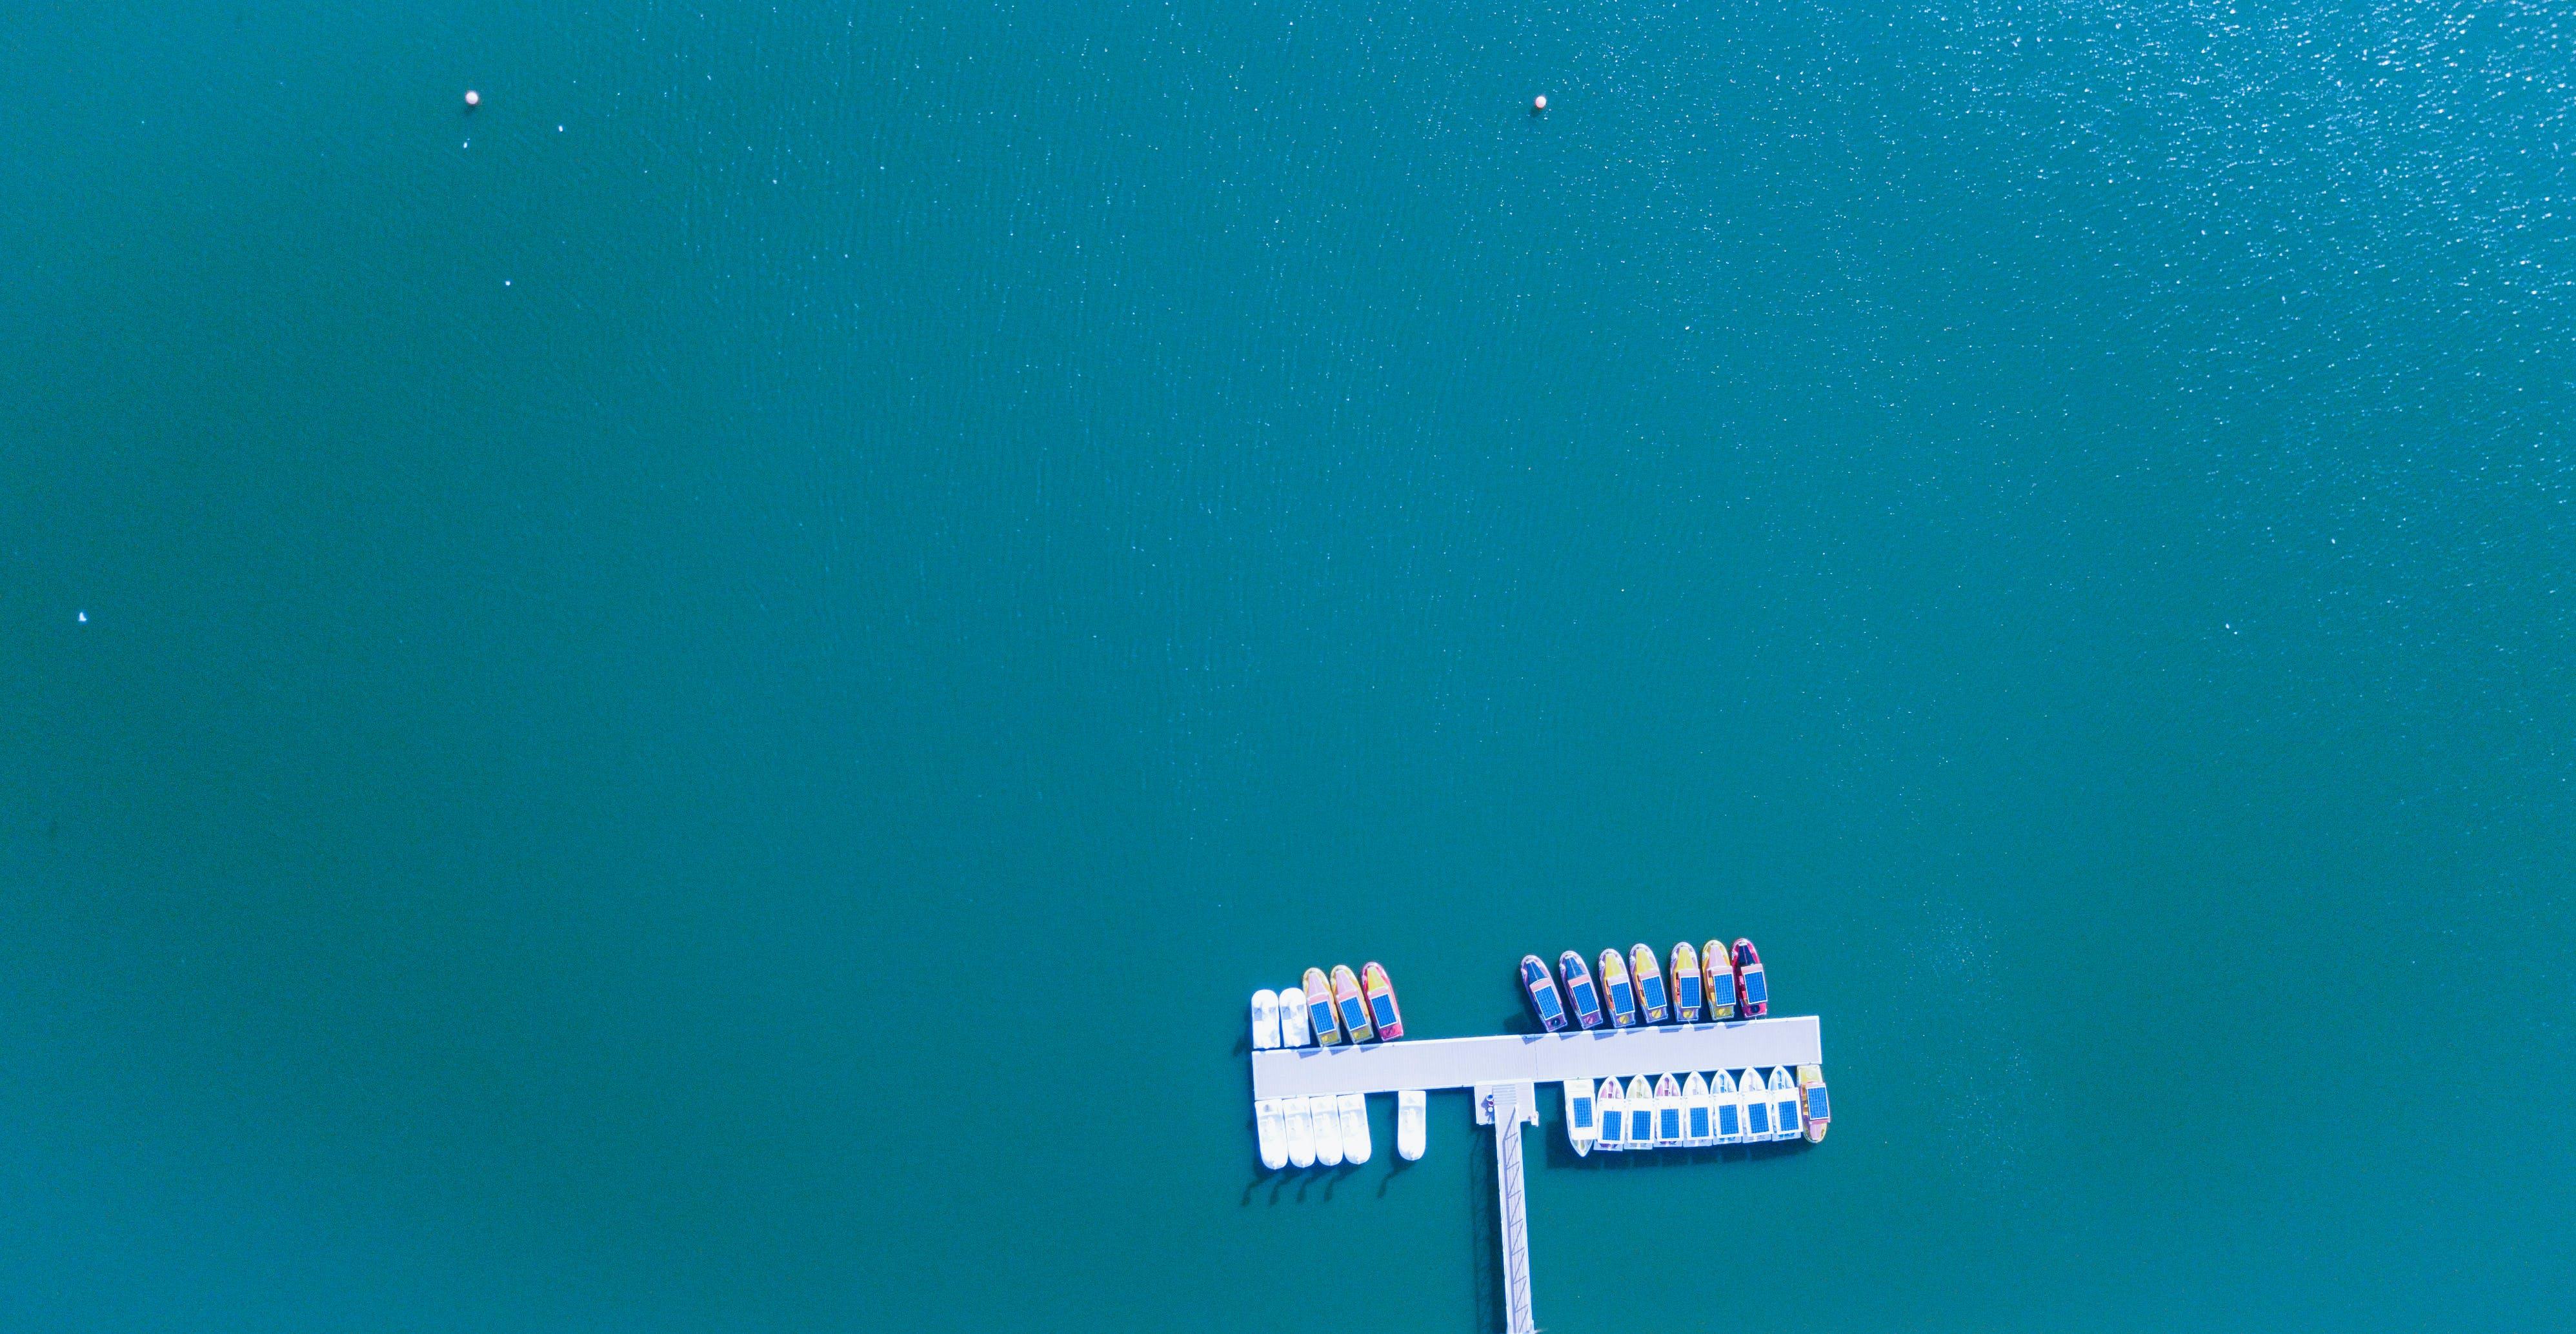 Free stock photo of sea, bird's eye view, water, ocean